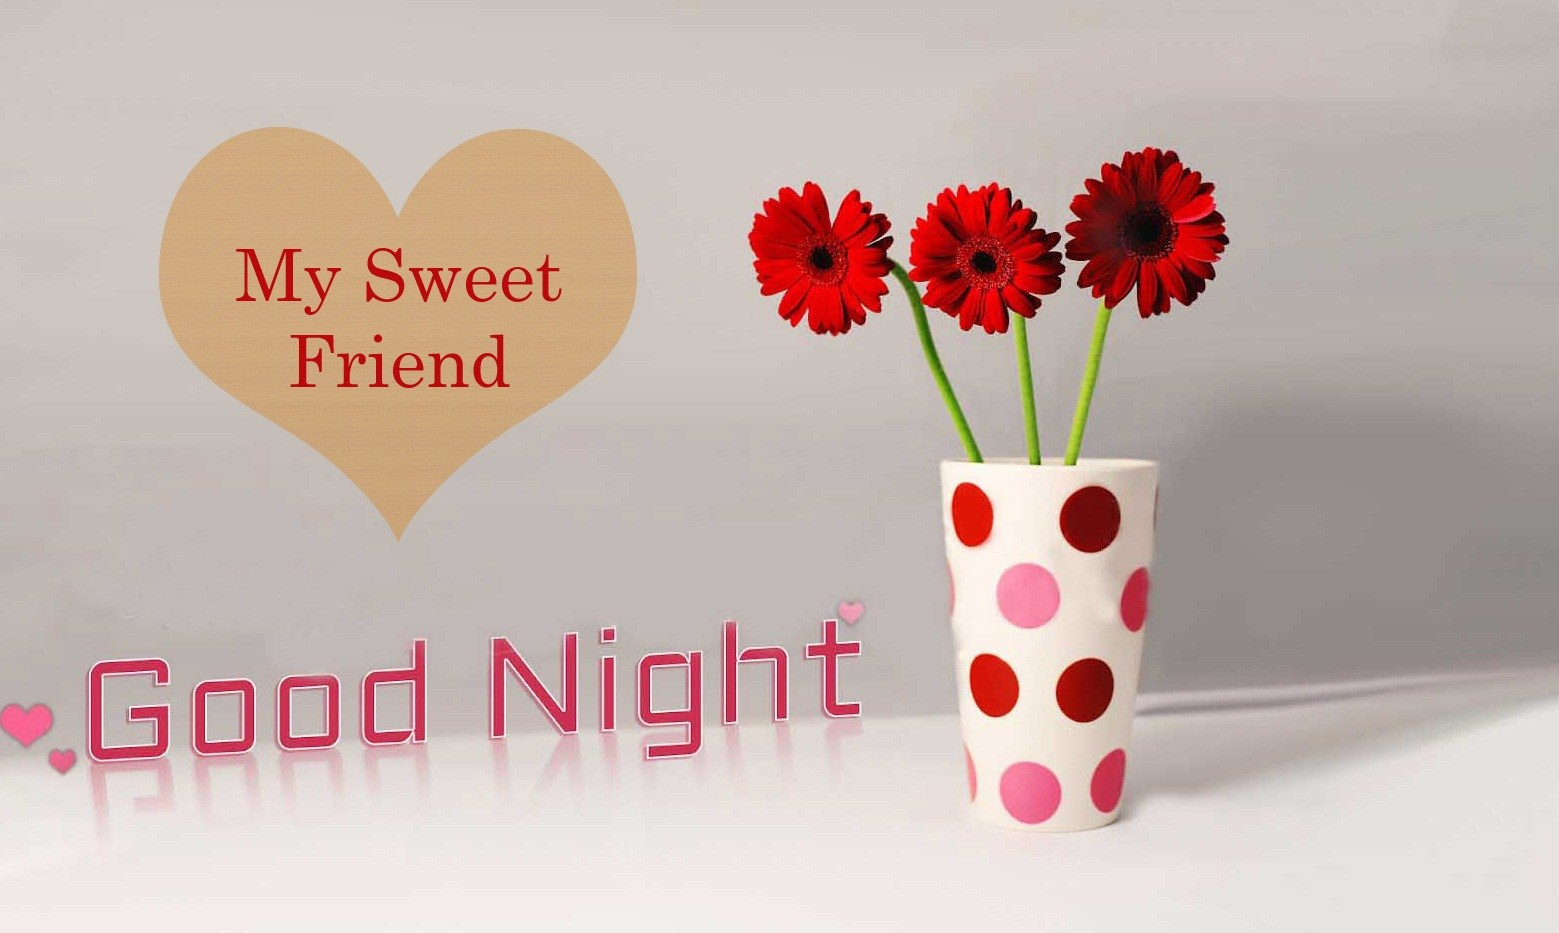 My Sweet Friend, Good Night